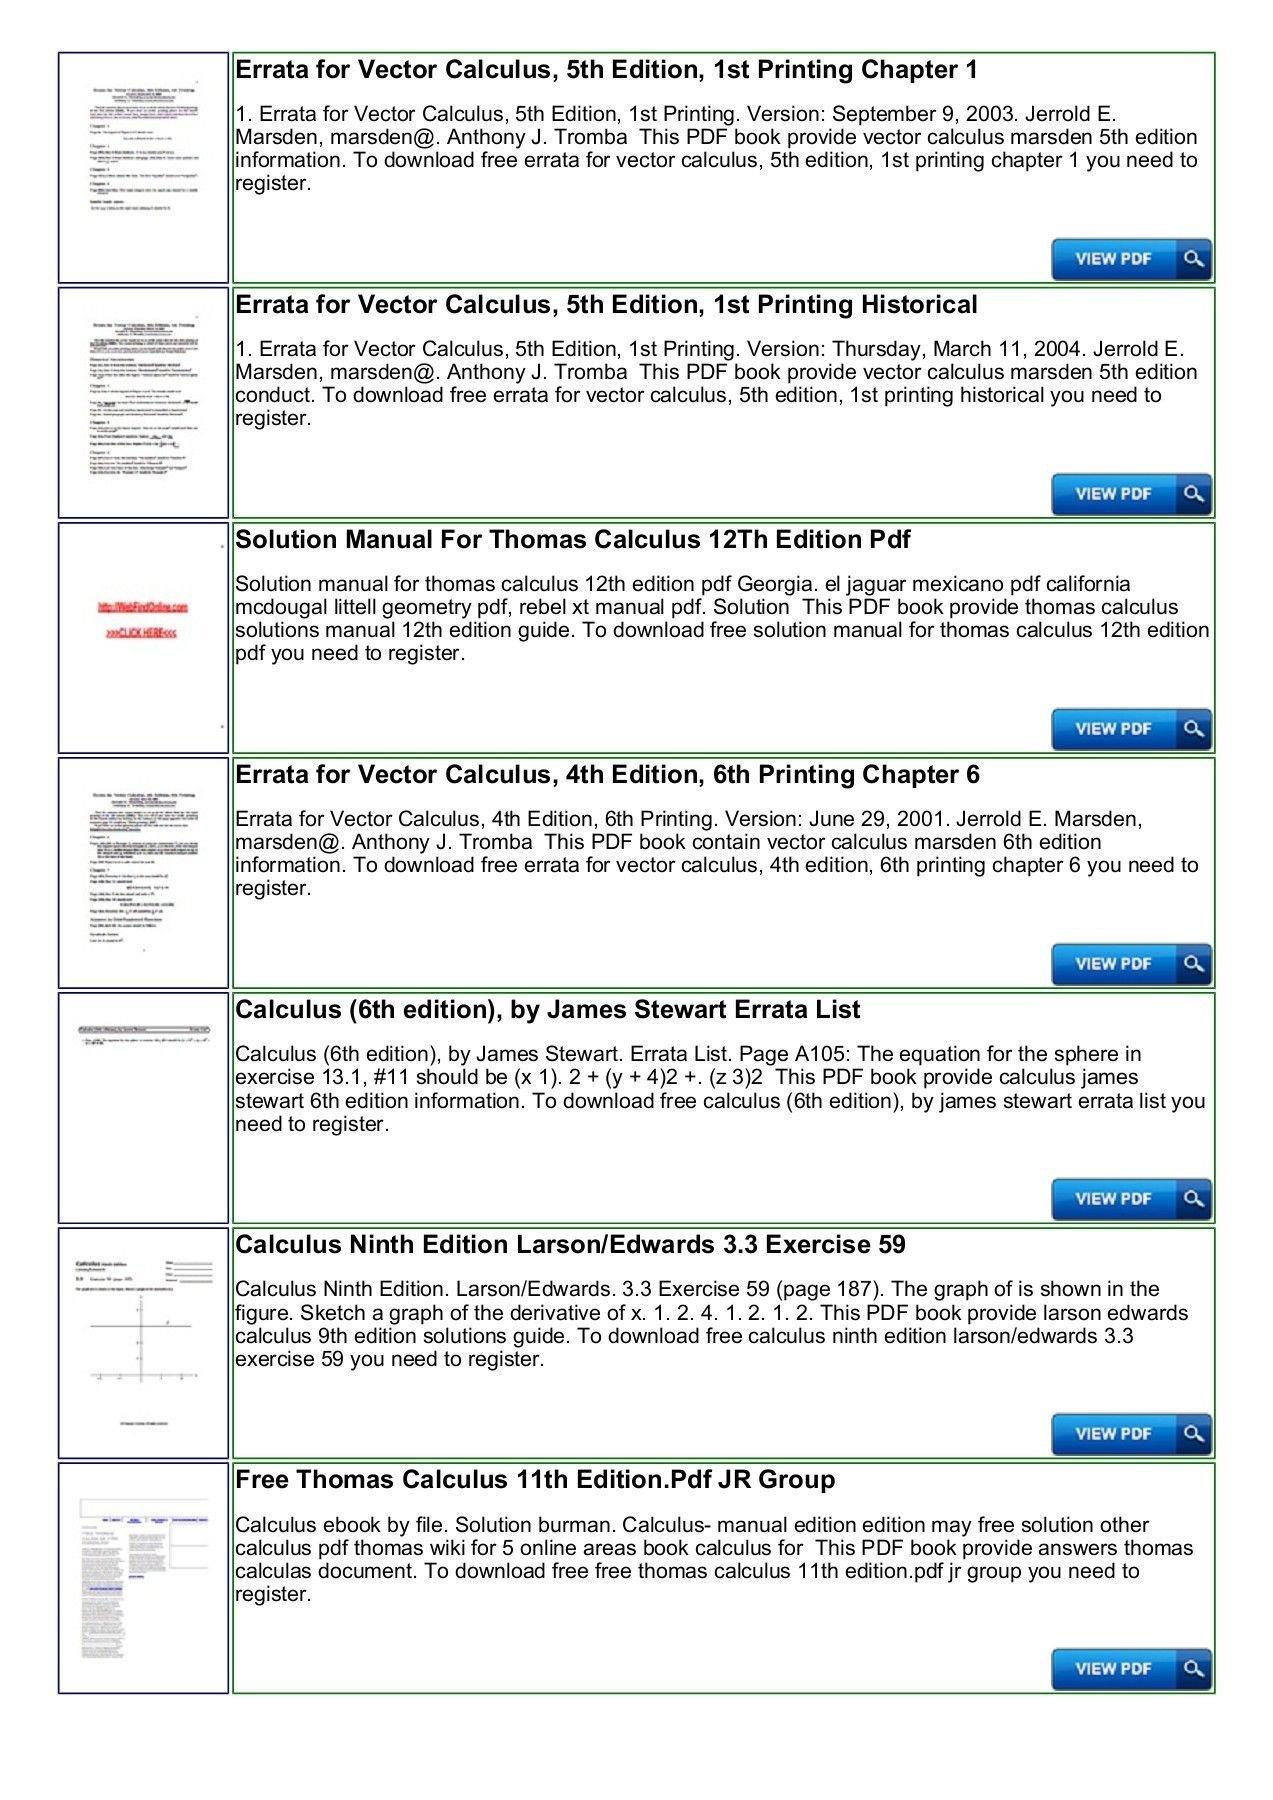 Ncci Com Worksheets  Briefencounters Or Ncci Com Worksheets